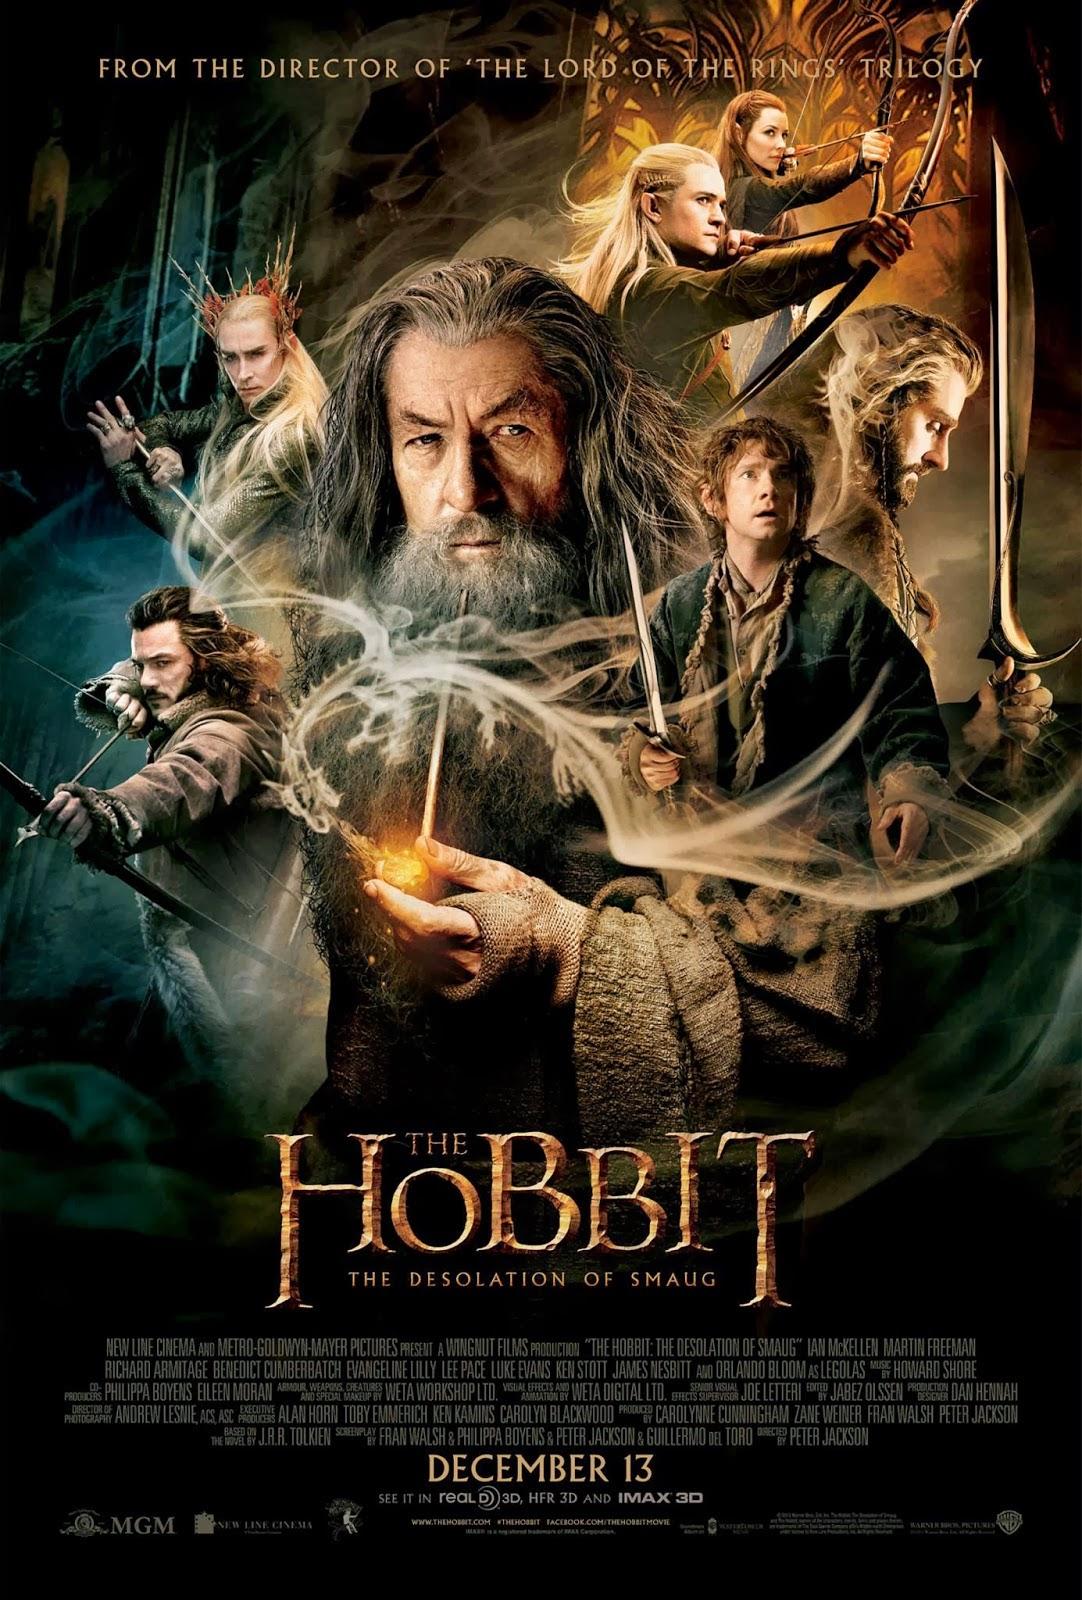 The Hobbit : The Desolation of Smaug เดอะ ฮอบบิท : ดินแดนเปลี่ยวร้างของสม็อค